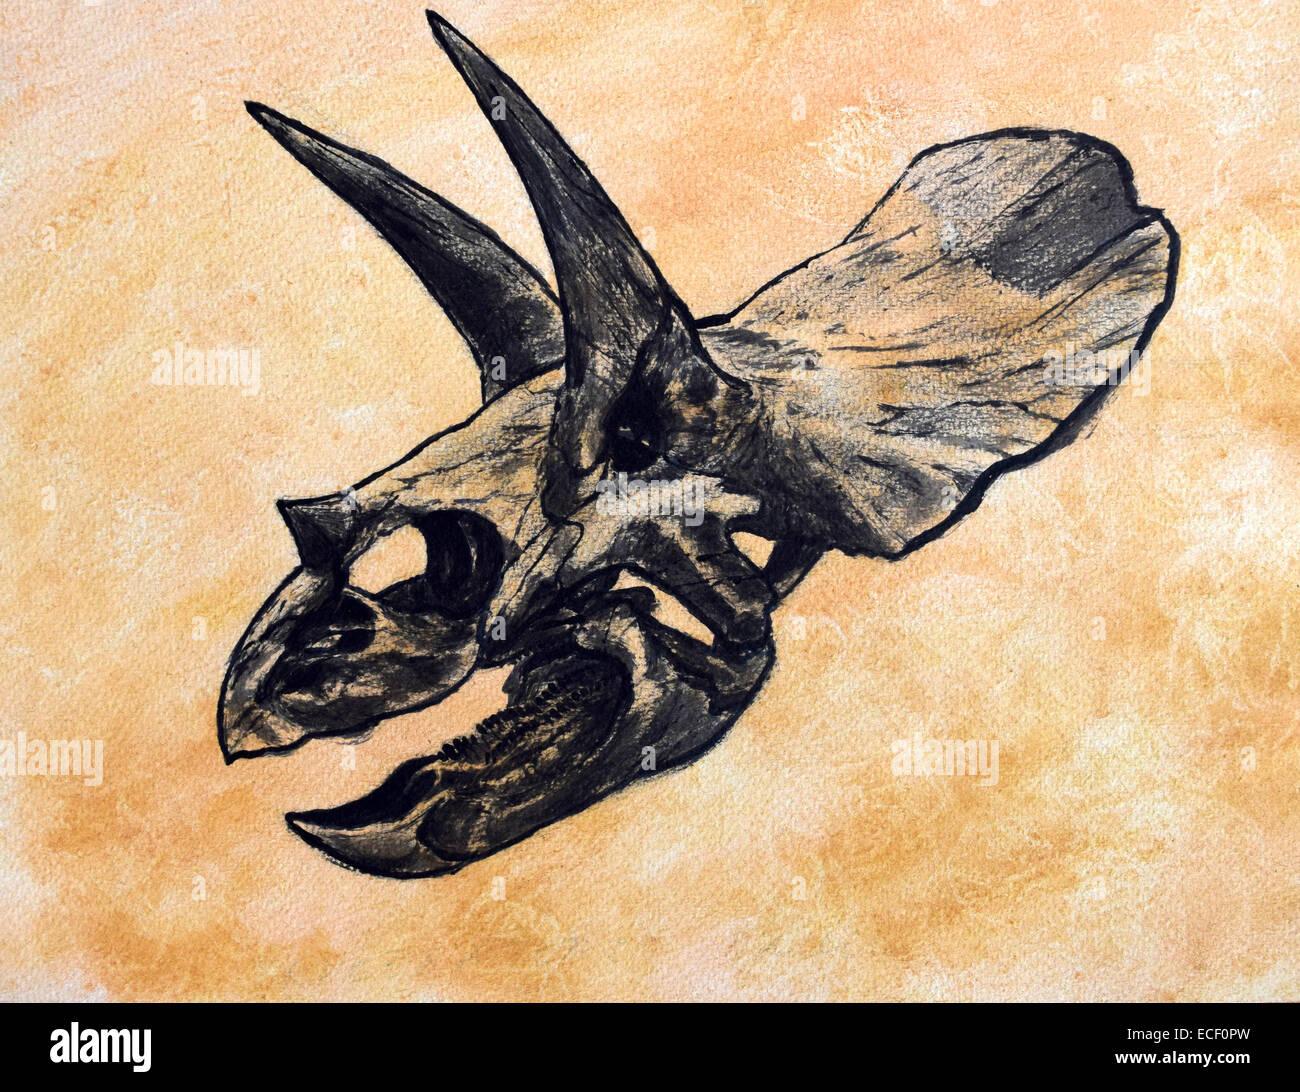 Triceratops dinosaur skull on textured background. - Stock Image